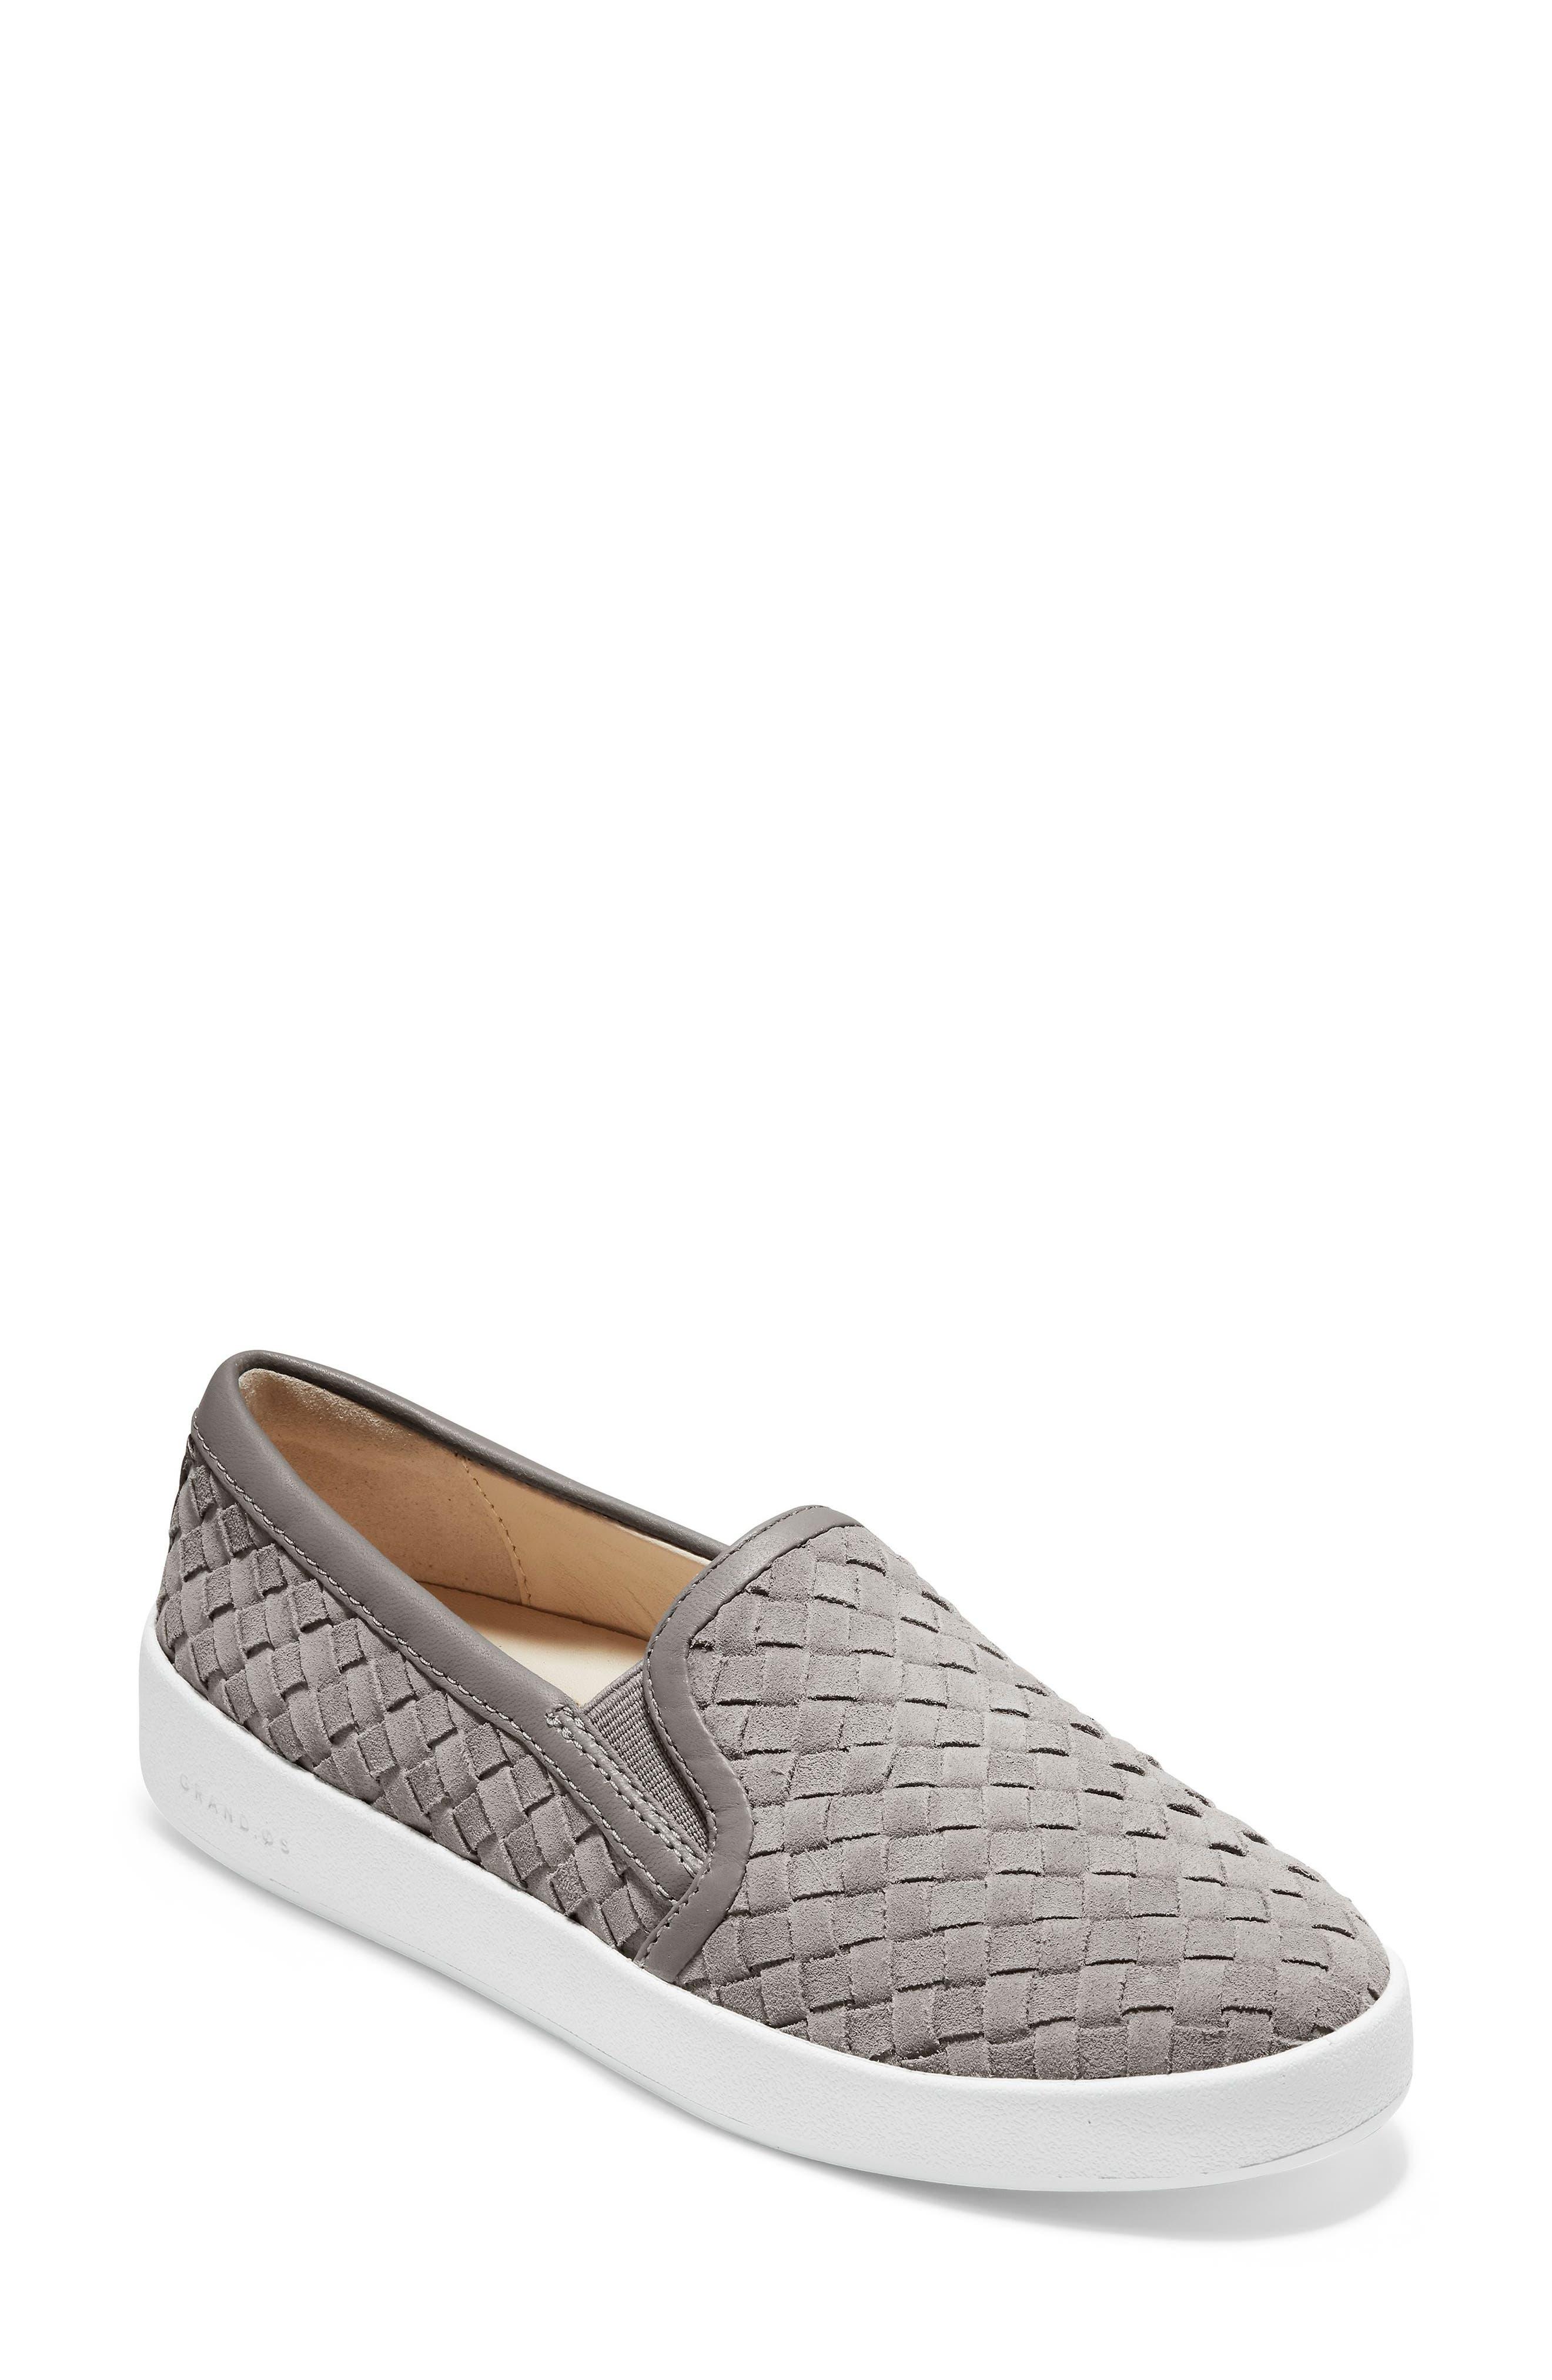 GrandPro Woven Slip-On Sneaker, Main, color, IRONSTONE WOVEN SUEDE